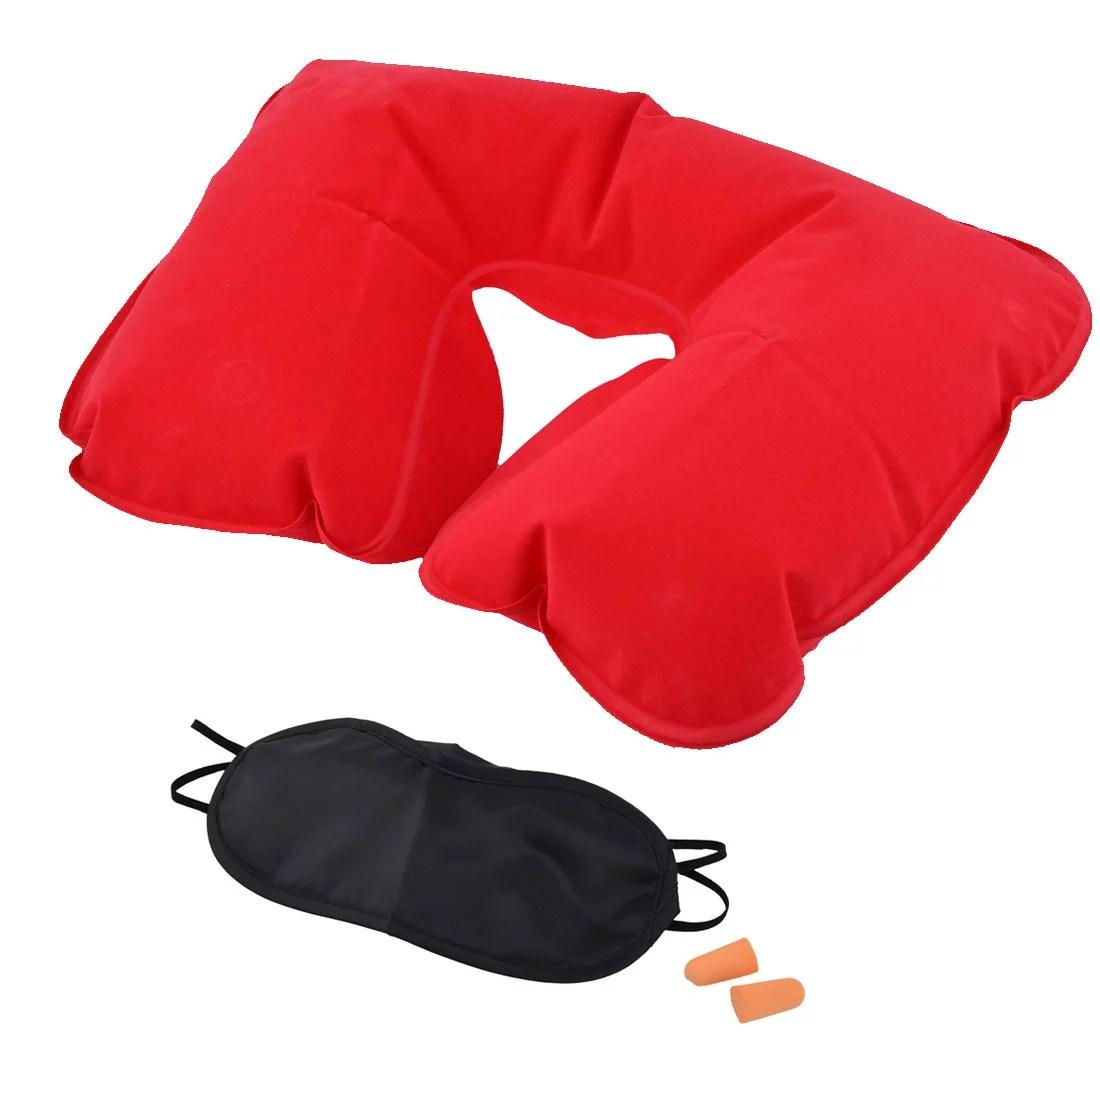 Travel U Shape Pillow Sleep Relax Inflatable Neck Eyes